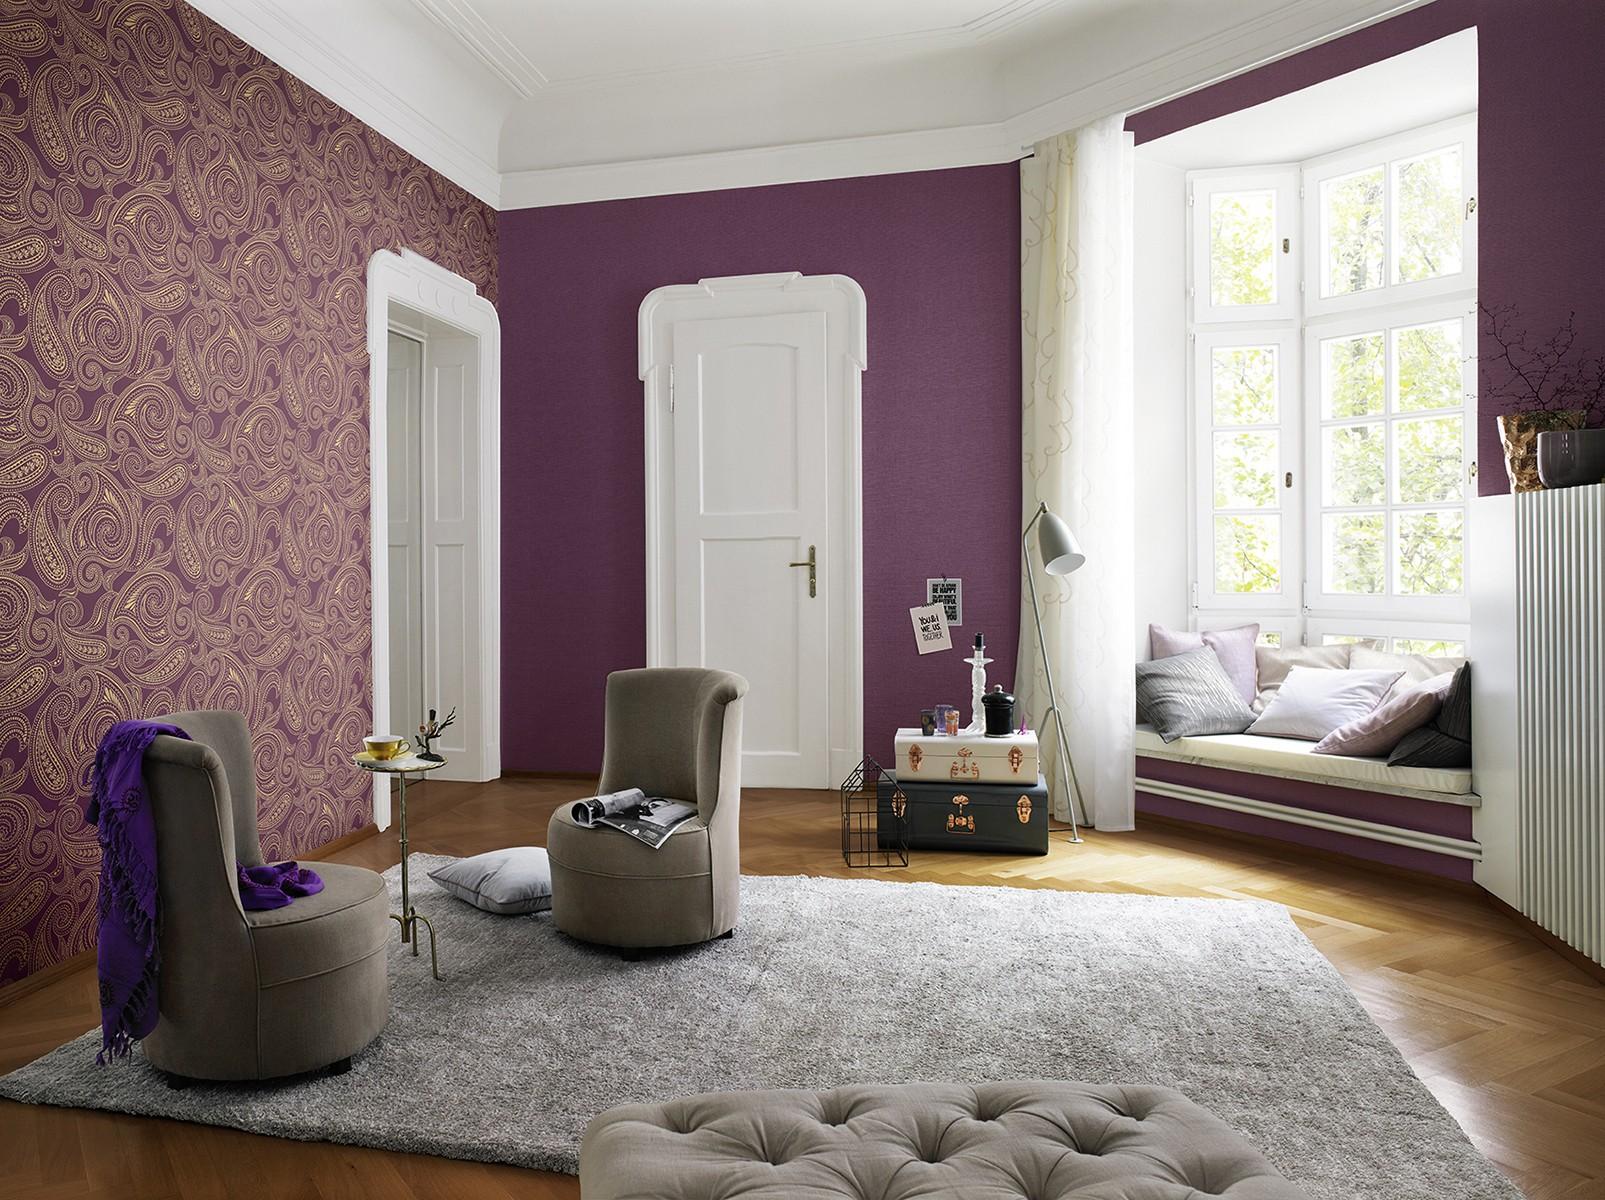 bb home passion Teppiche › Reinkemeier Rietberg  Handel